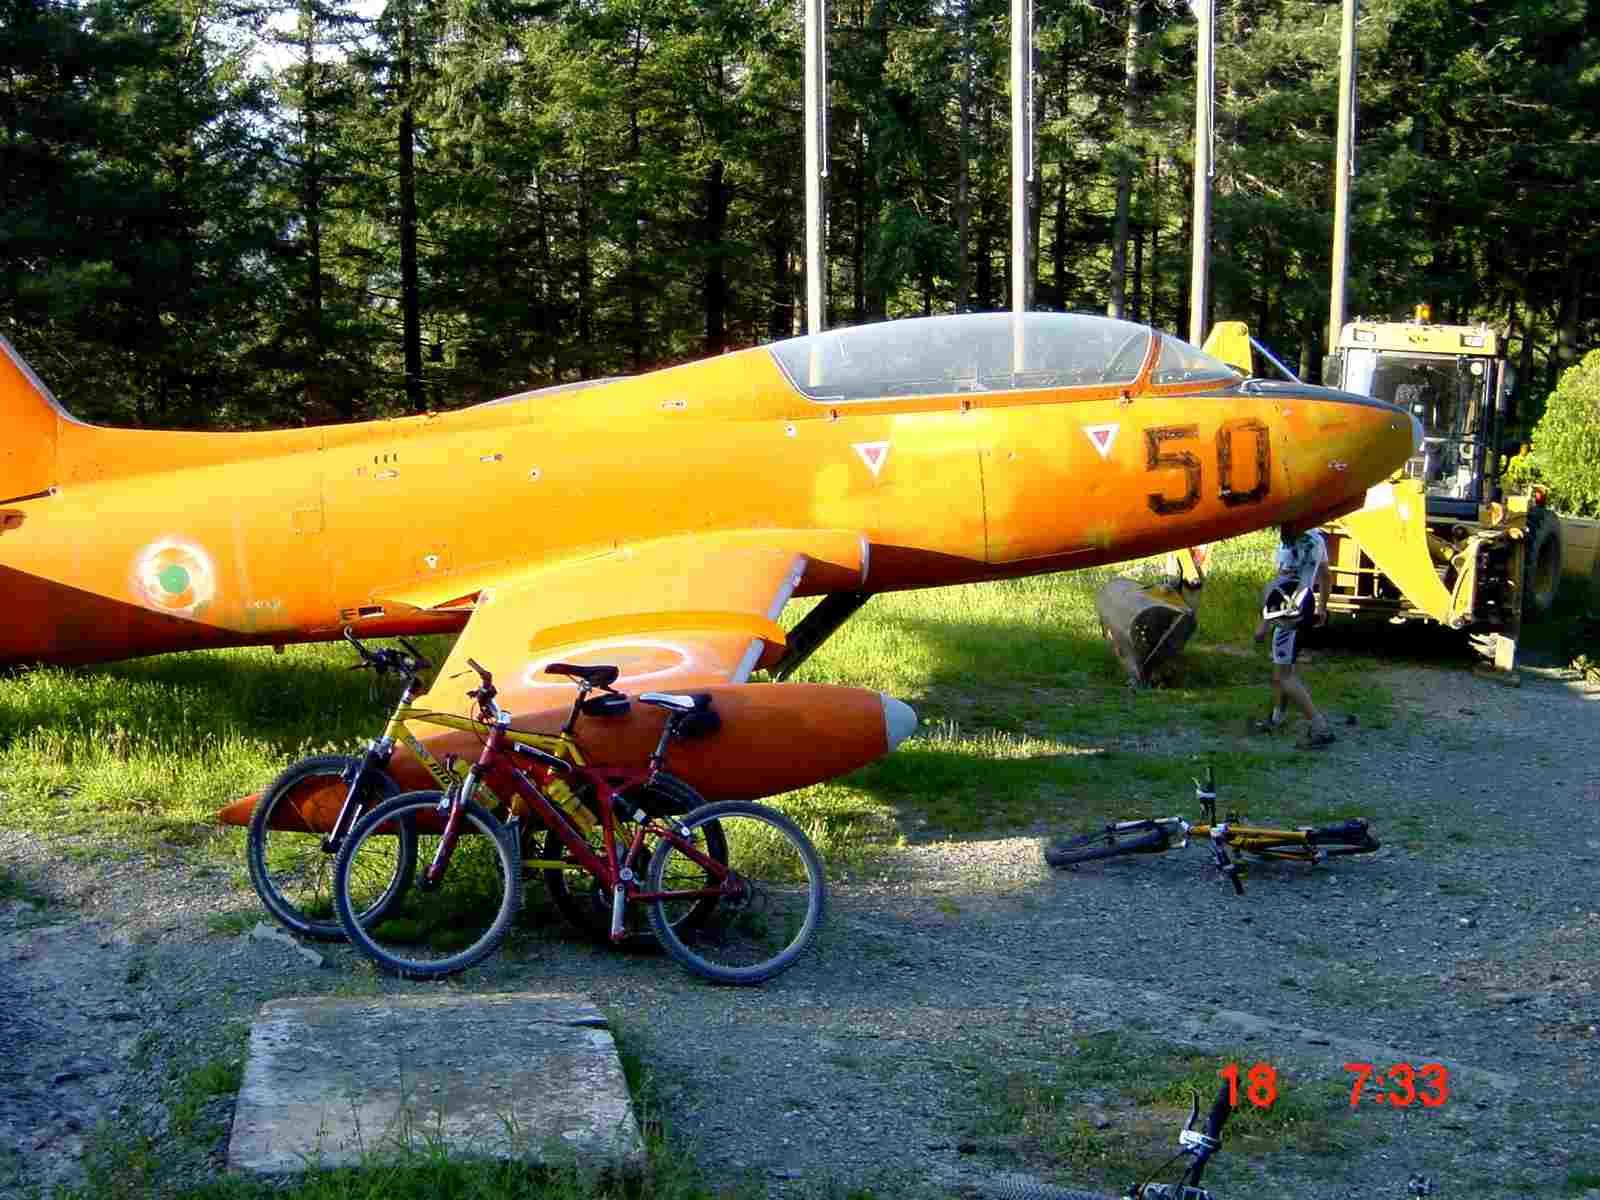 Foto: Manfred Karl / Mountainbike Tour / Monte Ginezzo, 928 m / Ob der noch abhebt? / 20.06.2007 06:22:31